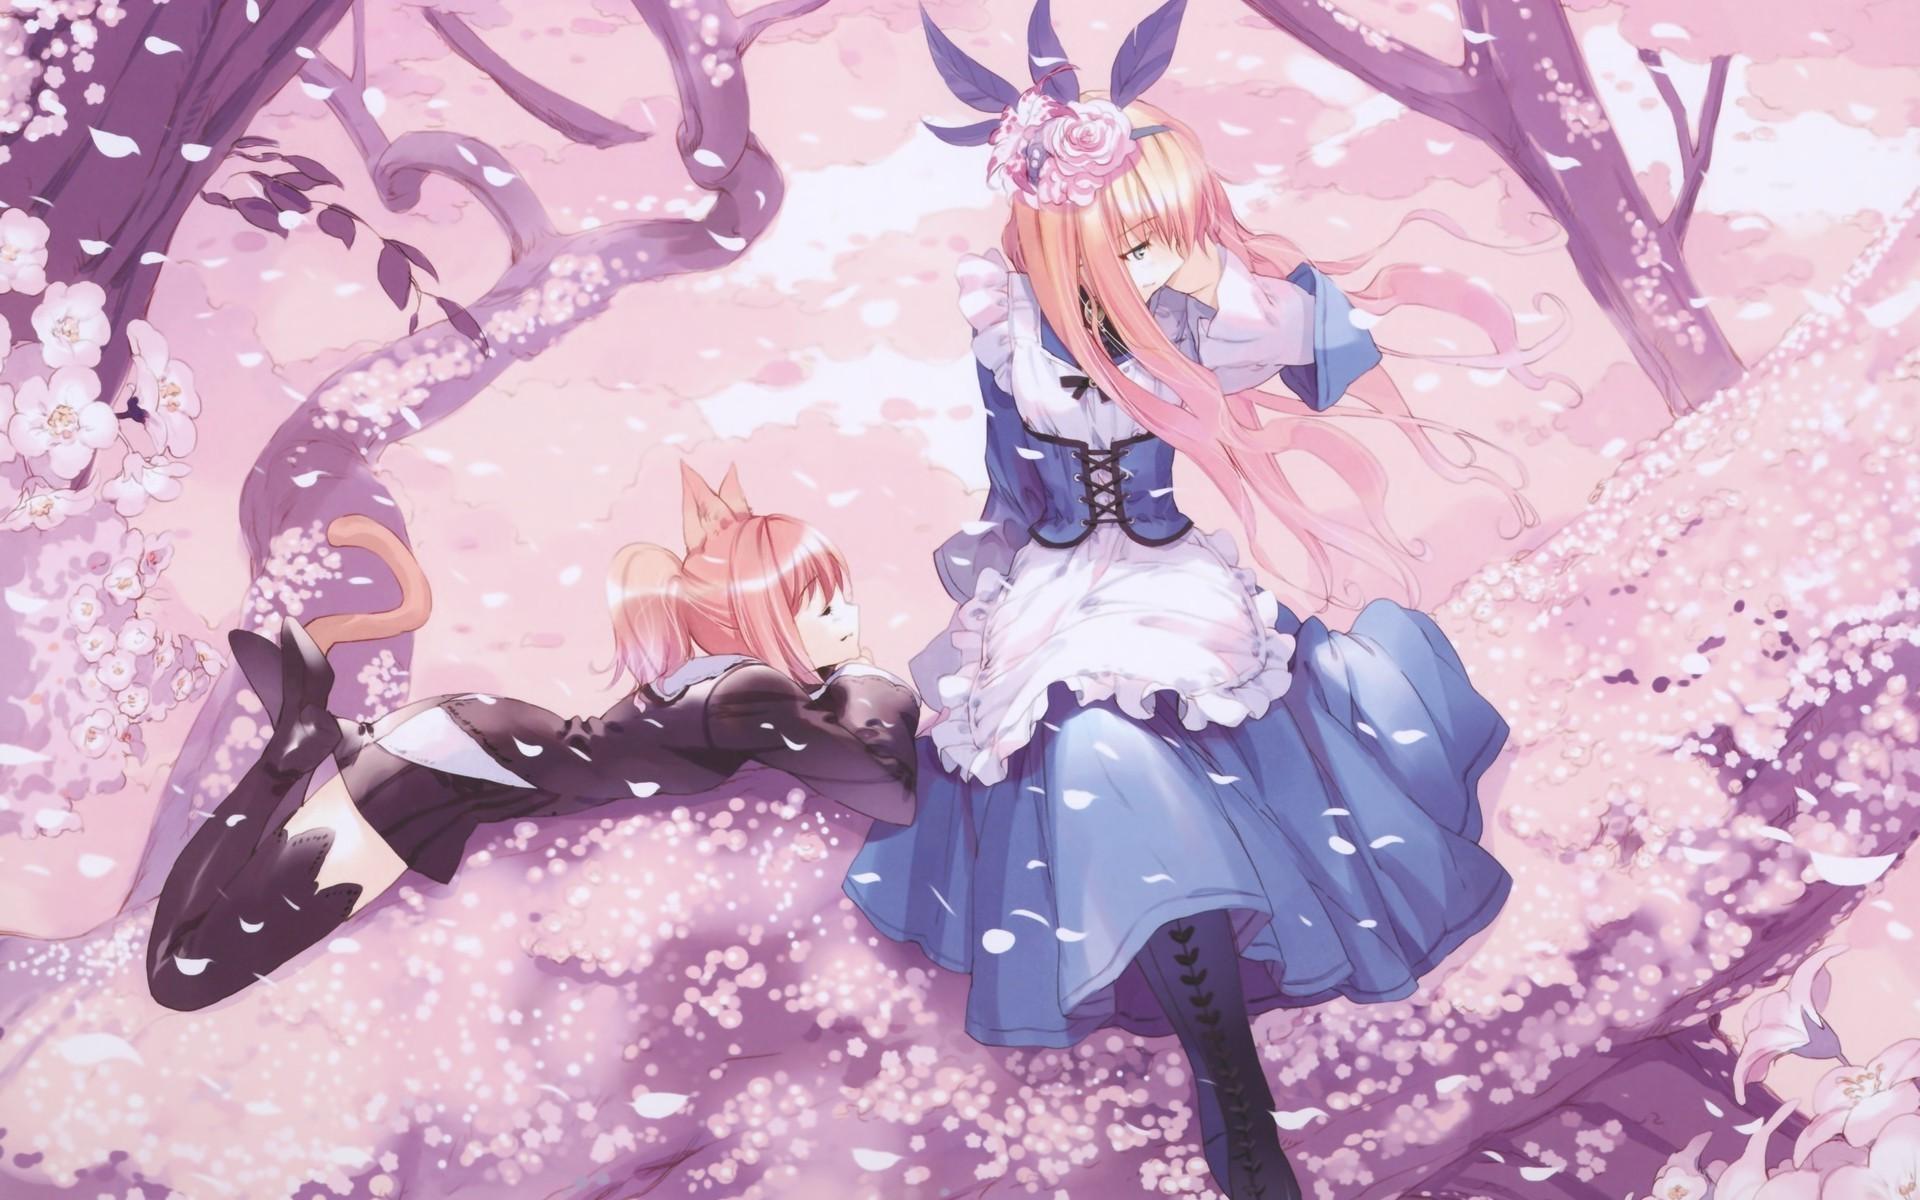 trees, Anime Girls, Cat Ears, Cherry Blossom, Dress, Anime, Alice In  Wonderland Wallpapers HD / Desktop and Mobile Backgrounds